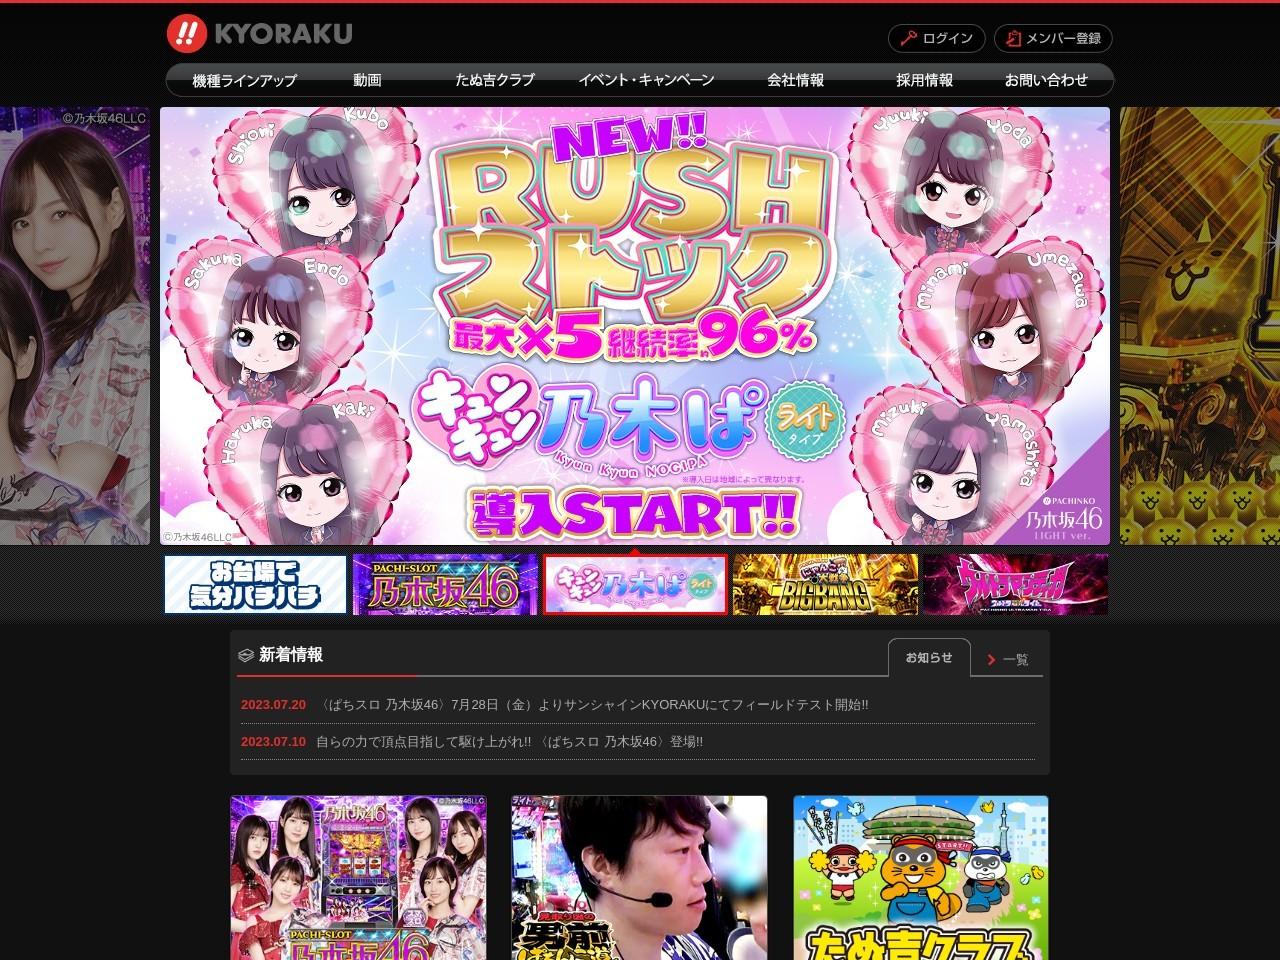 KYORAKUオフィシャルサイト | TOP